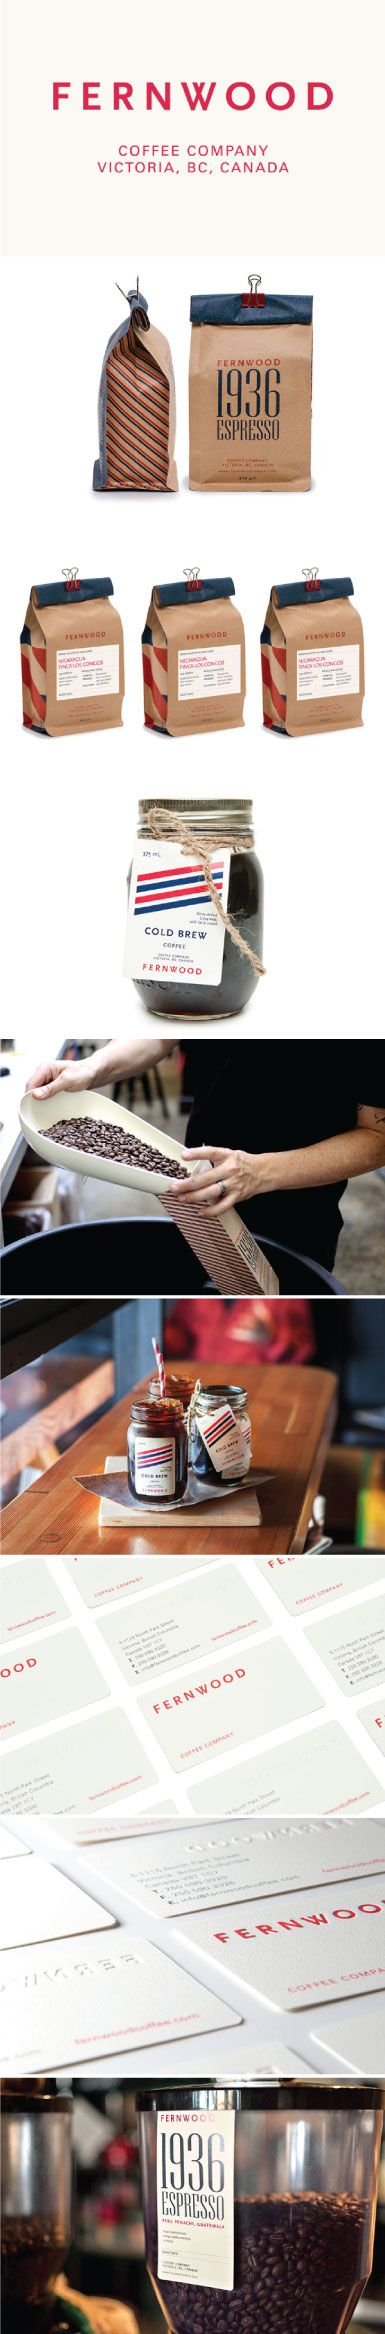 Fernwood Coffee PD #packaging #design